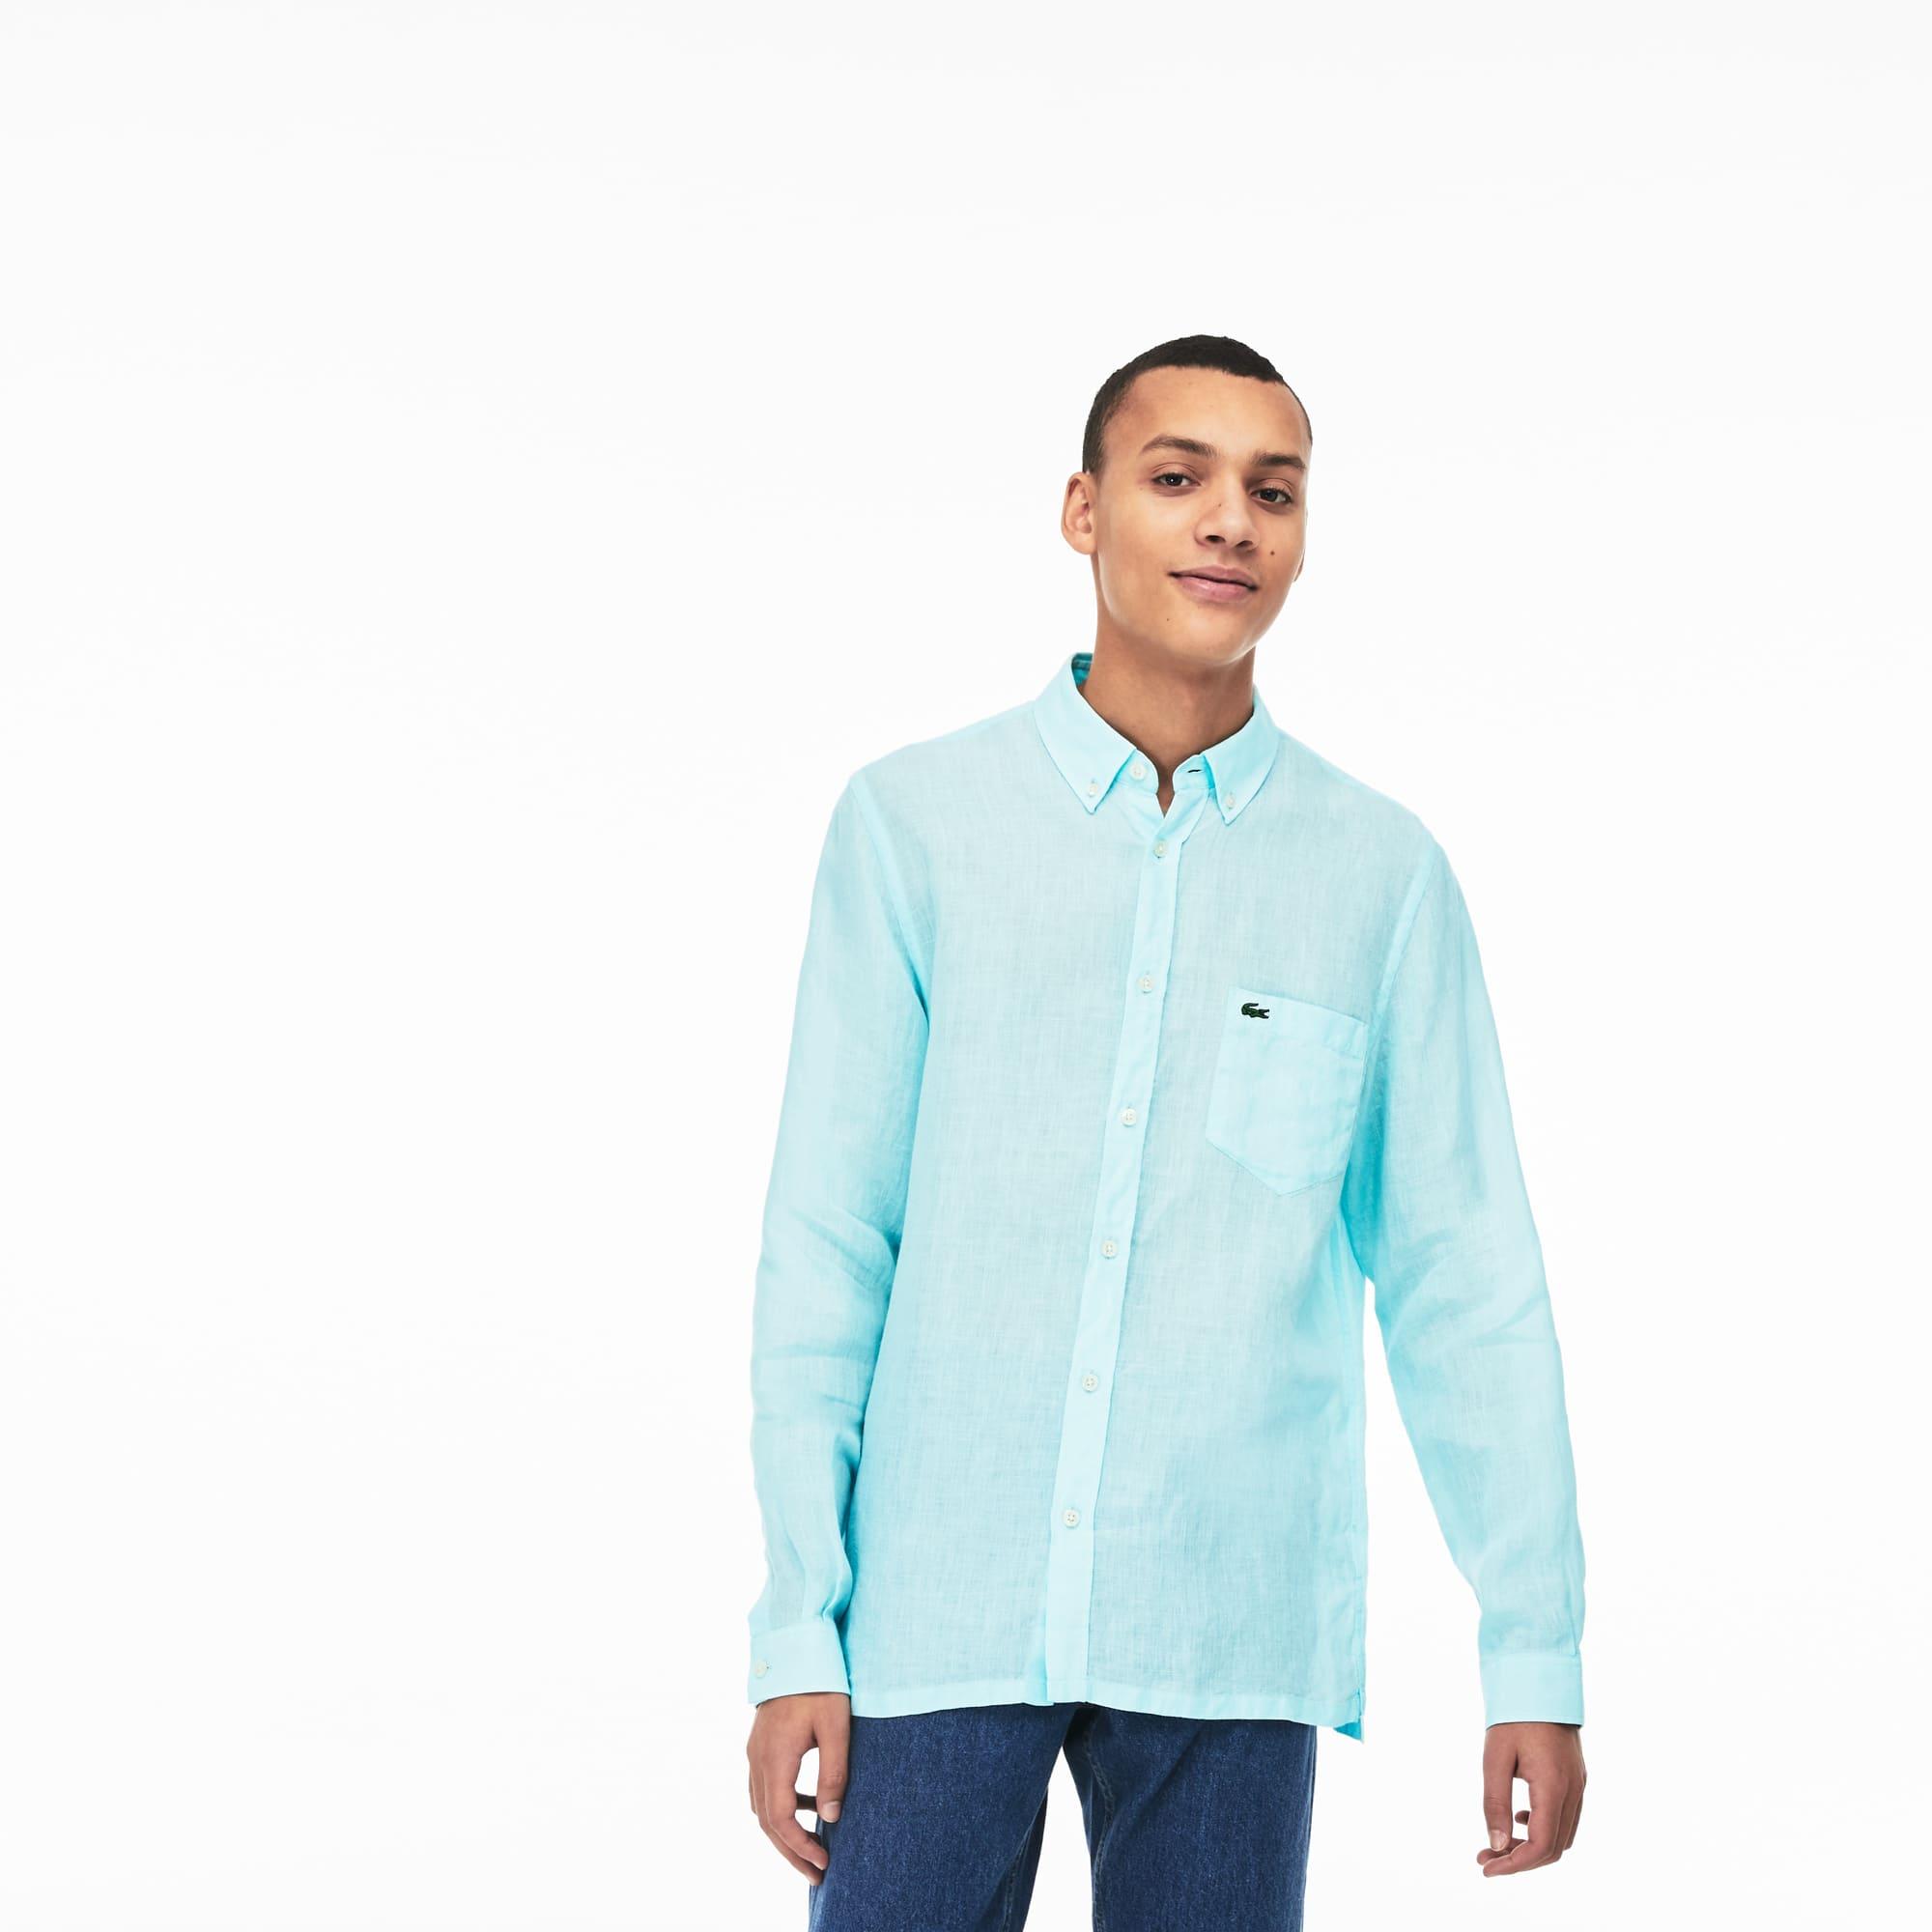 Camisa adolescente Junior corto manga de lino fino camisas